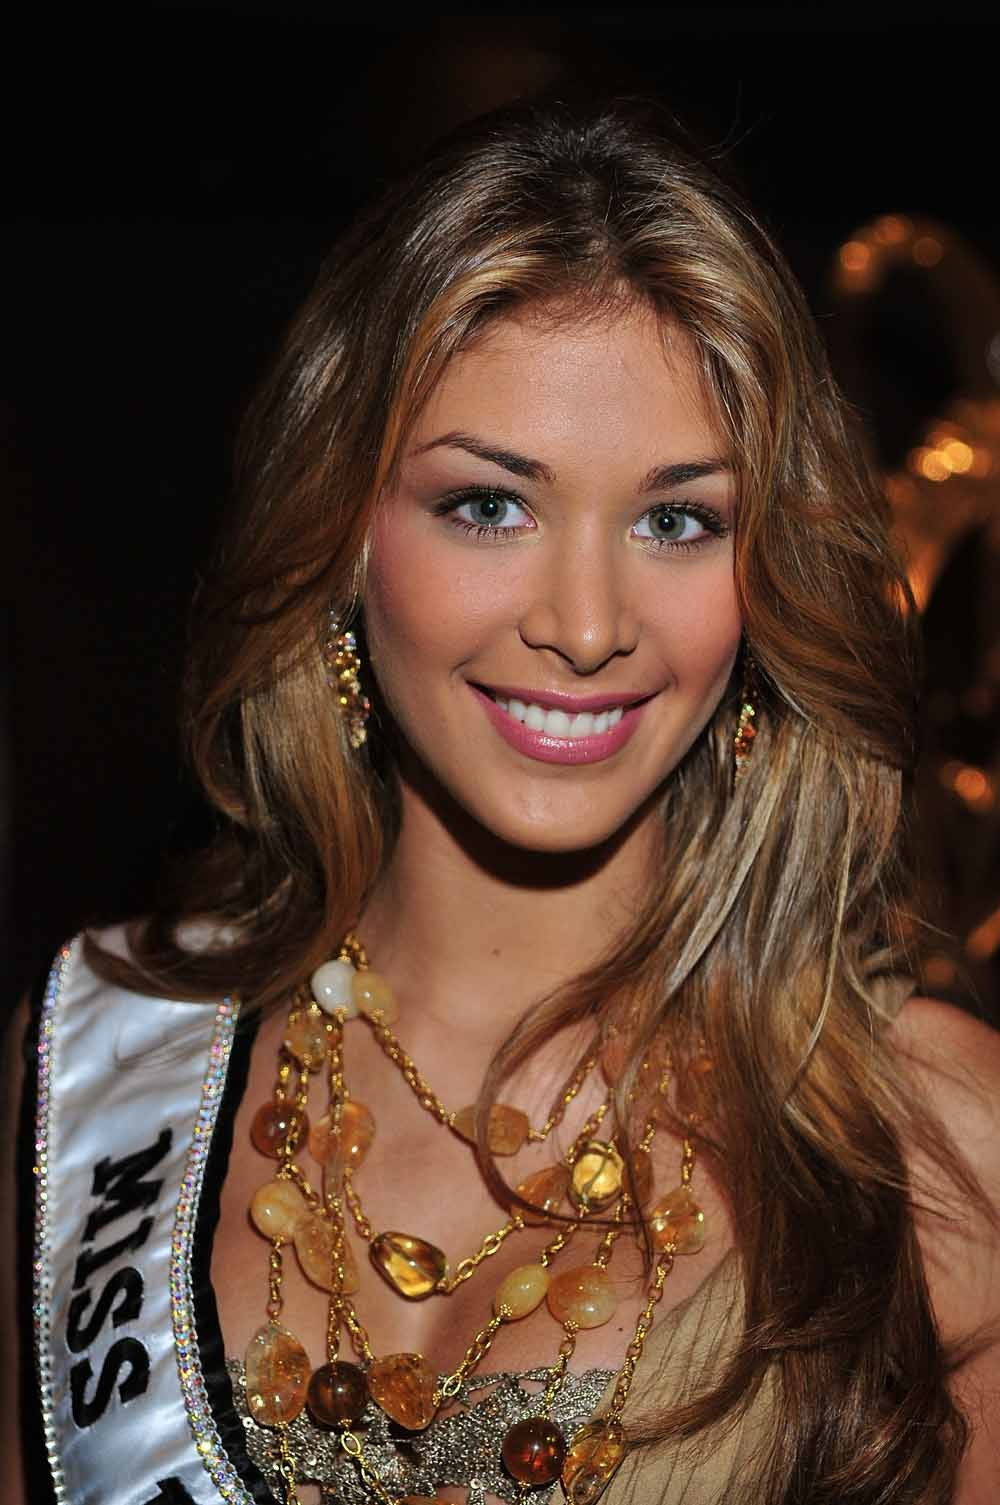 De Venezolaanse Miss Universe 2008 Dayana Mendoza. Venezuela gooit steevast hoge ogen bij missverkiezingen. – © Brian Killian / WireImag